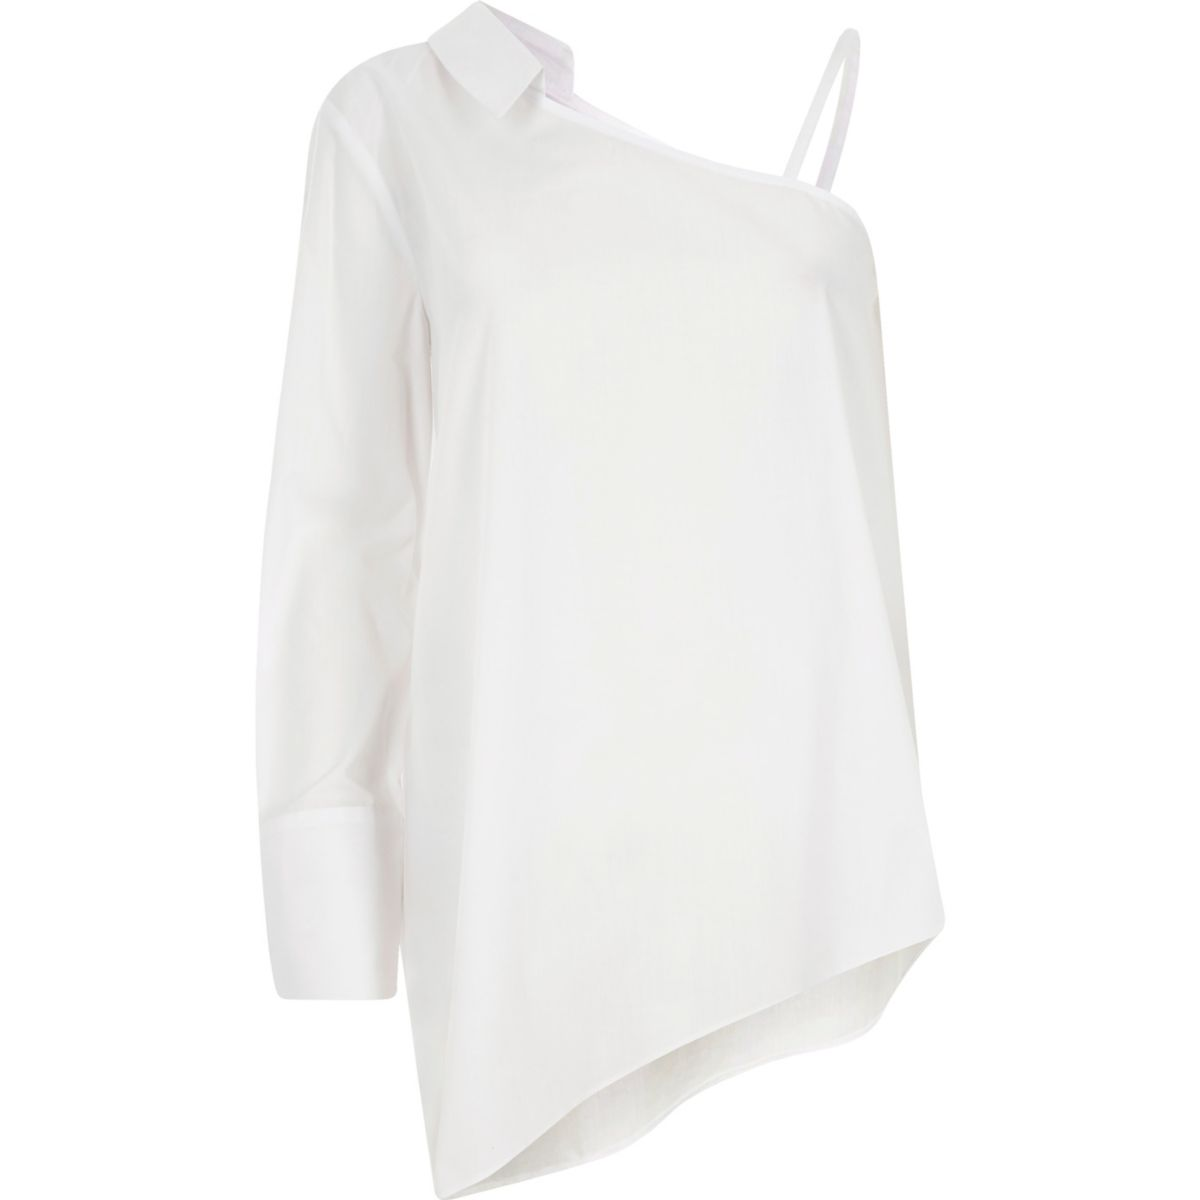 White one shoulder long sleeve shirt